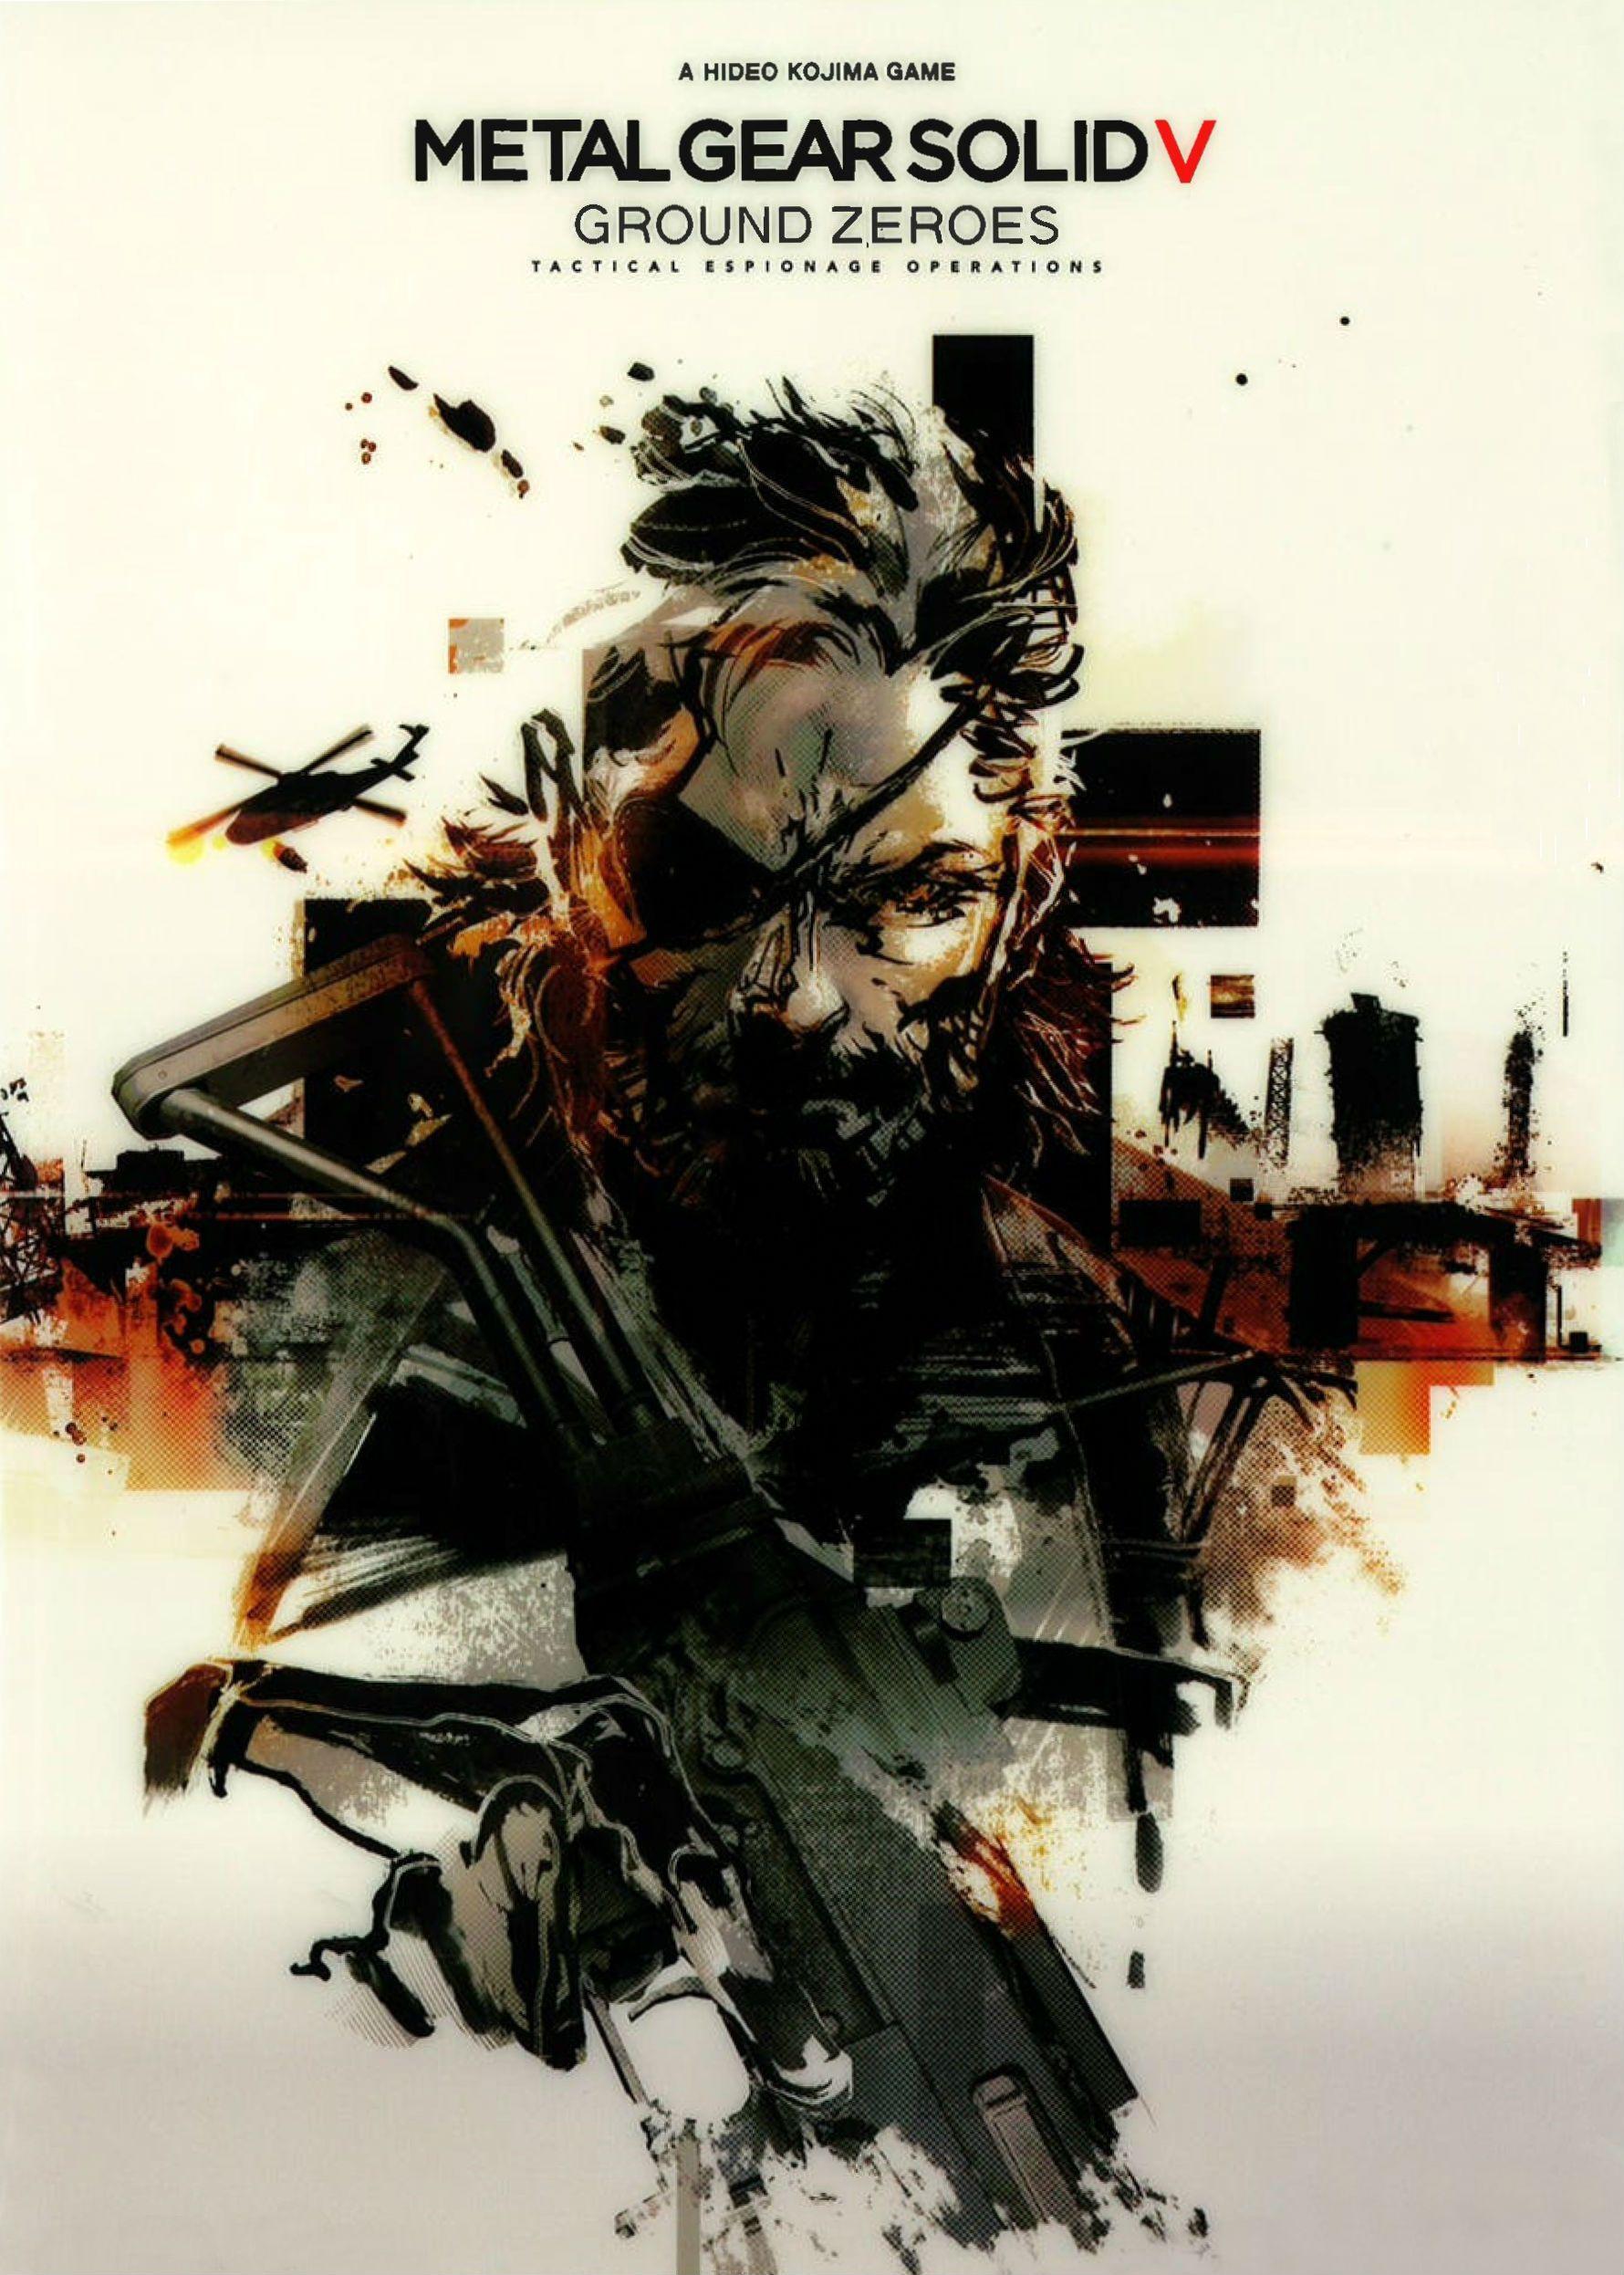 Metal Gear Solid Poster Google Search Metal Gear Metal Gear Solid Zahnrader